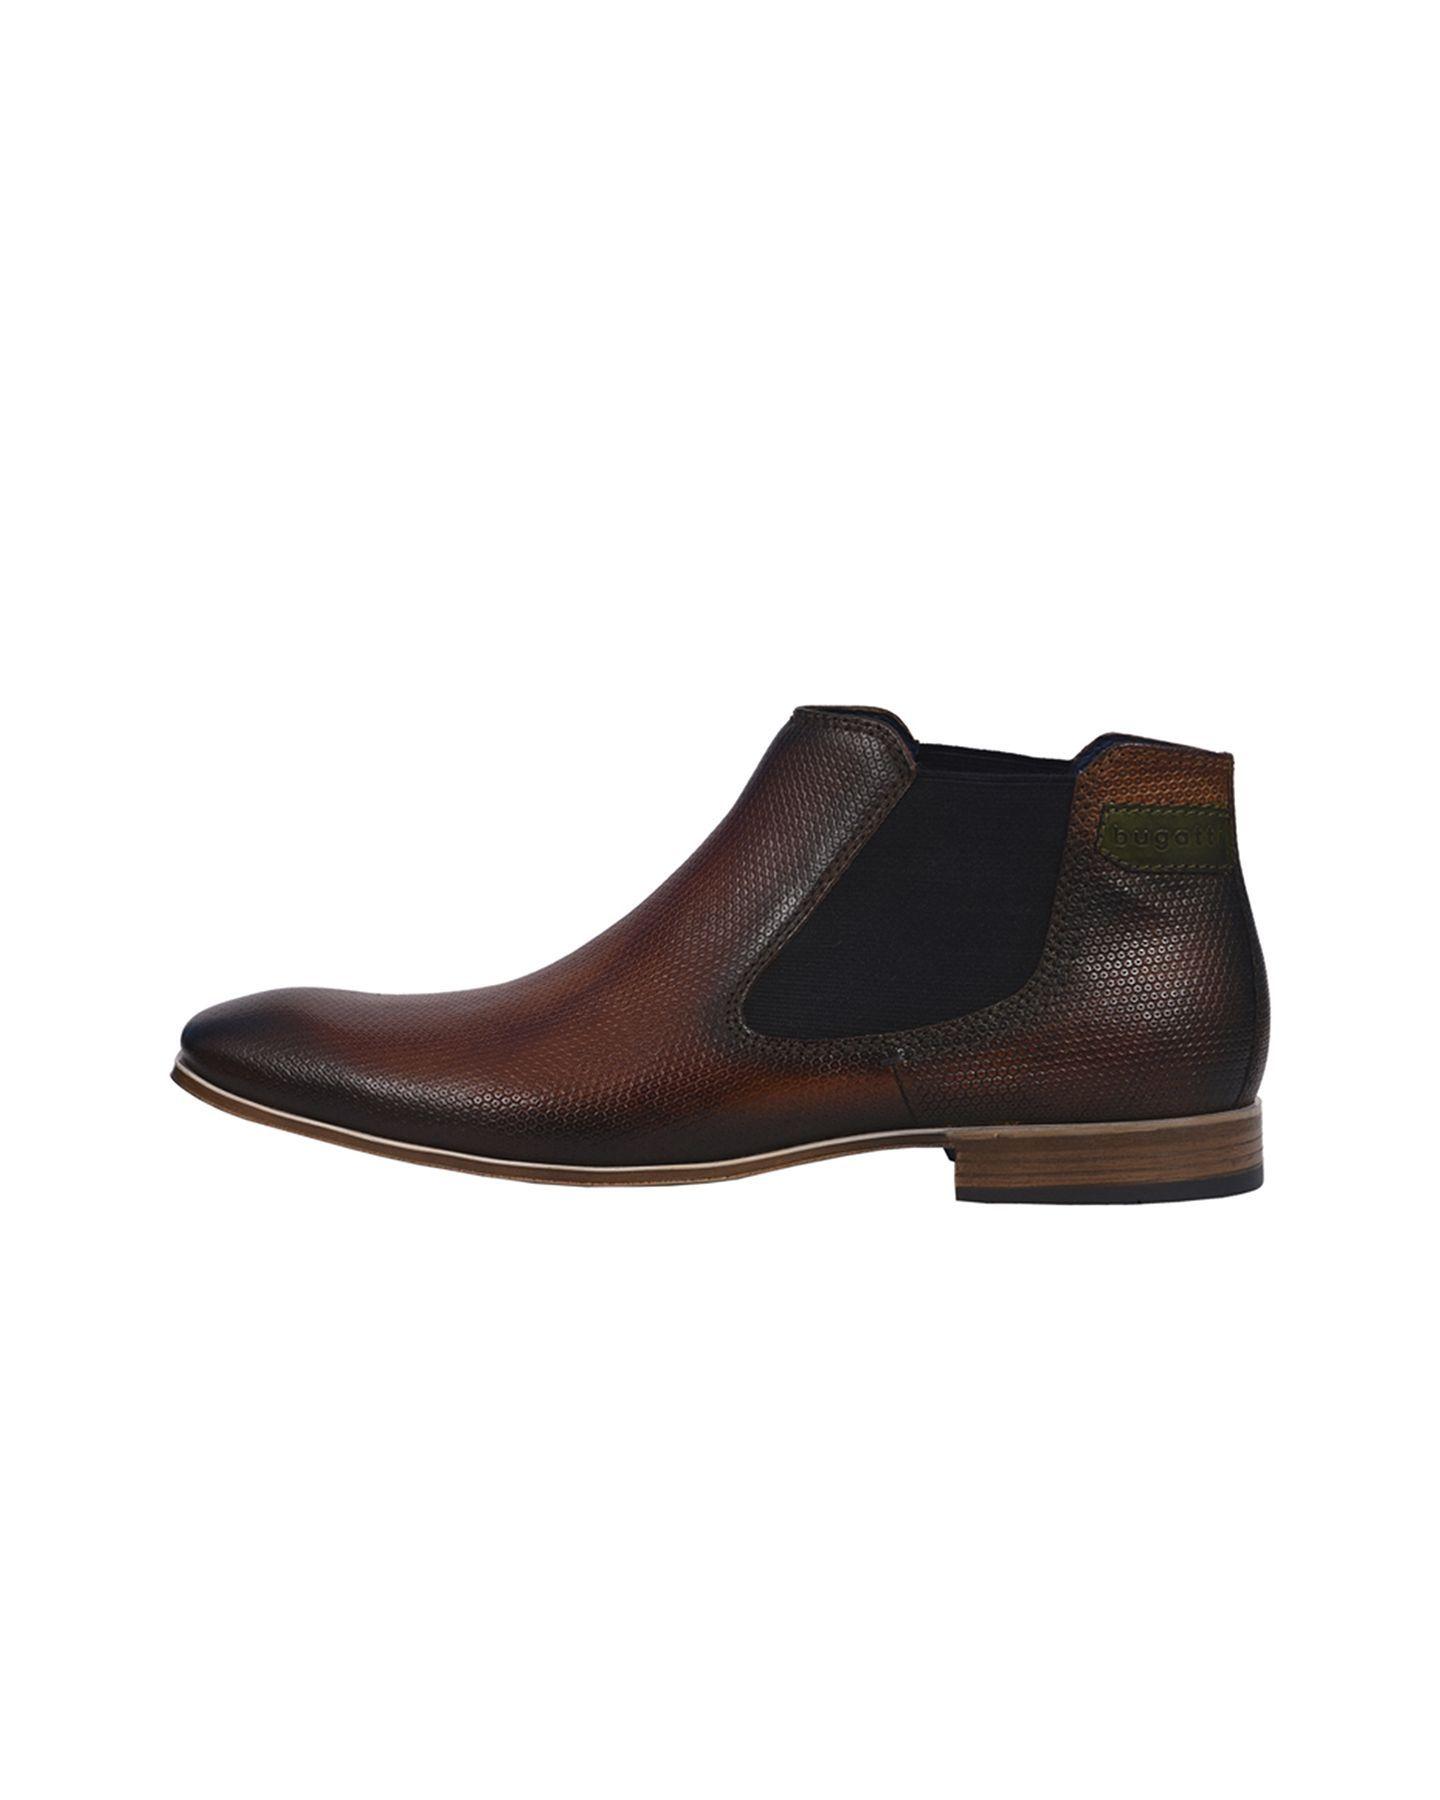 bugatti Chelsea boots in cognac in Größe 42